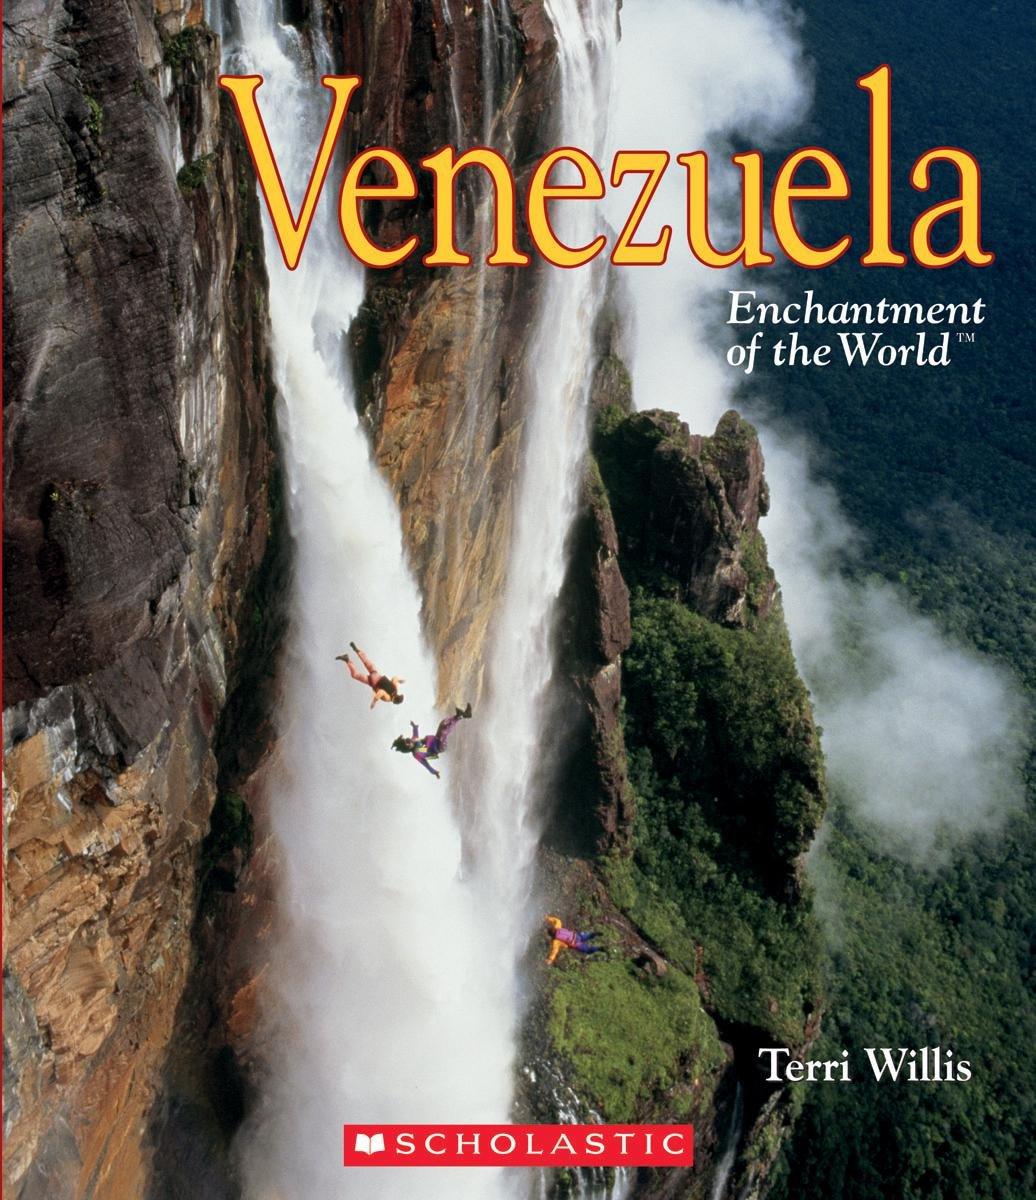 Venezuela (Enchantment of the World, Second Series)